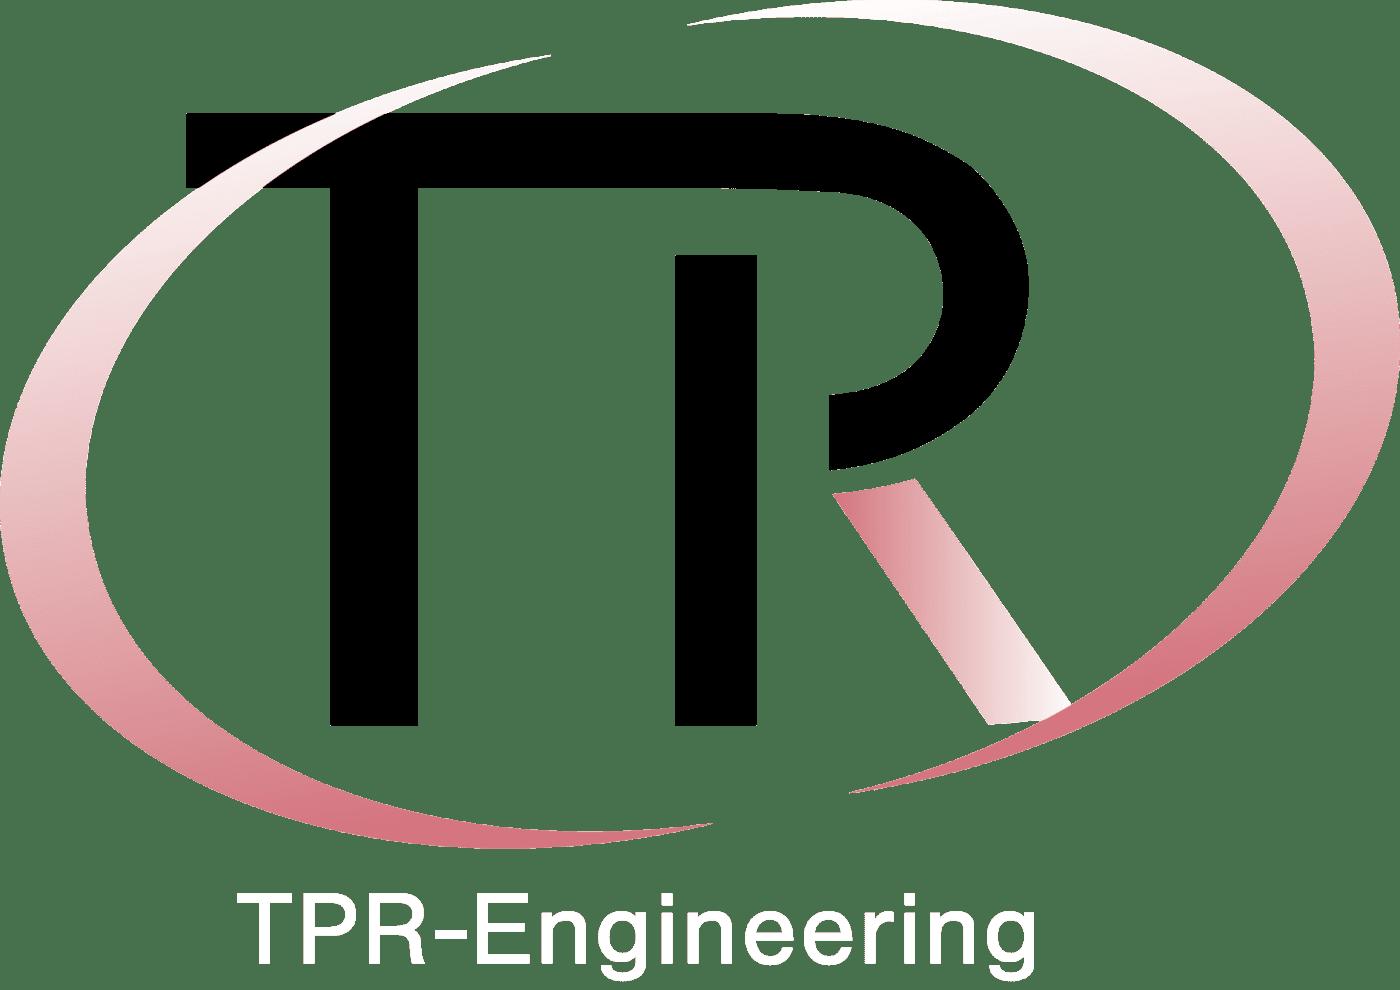 TPR-engineering